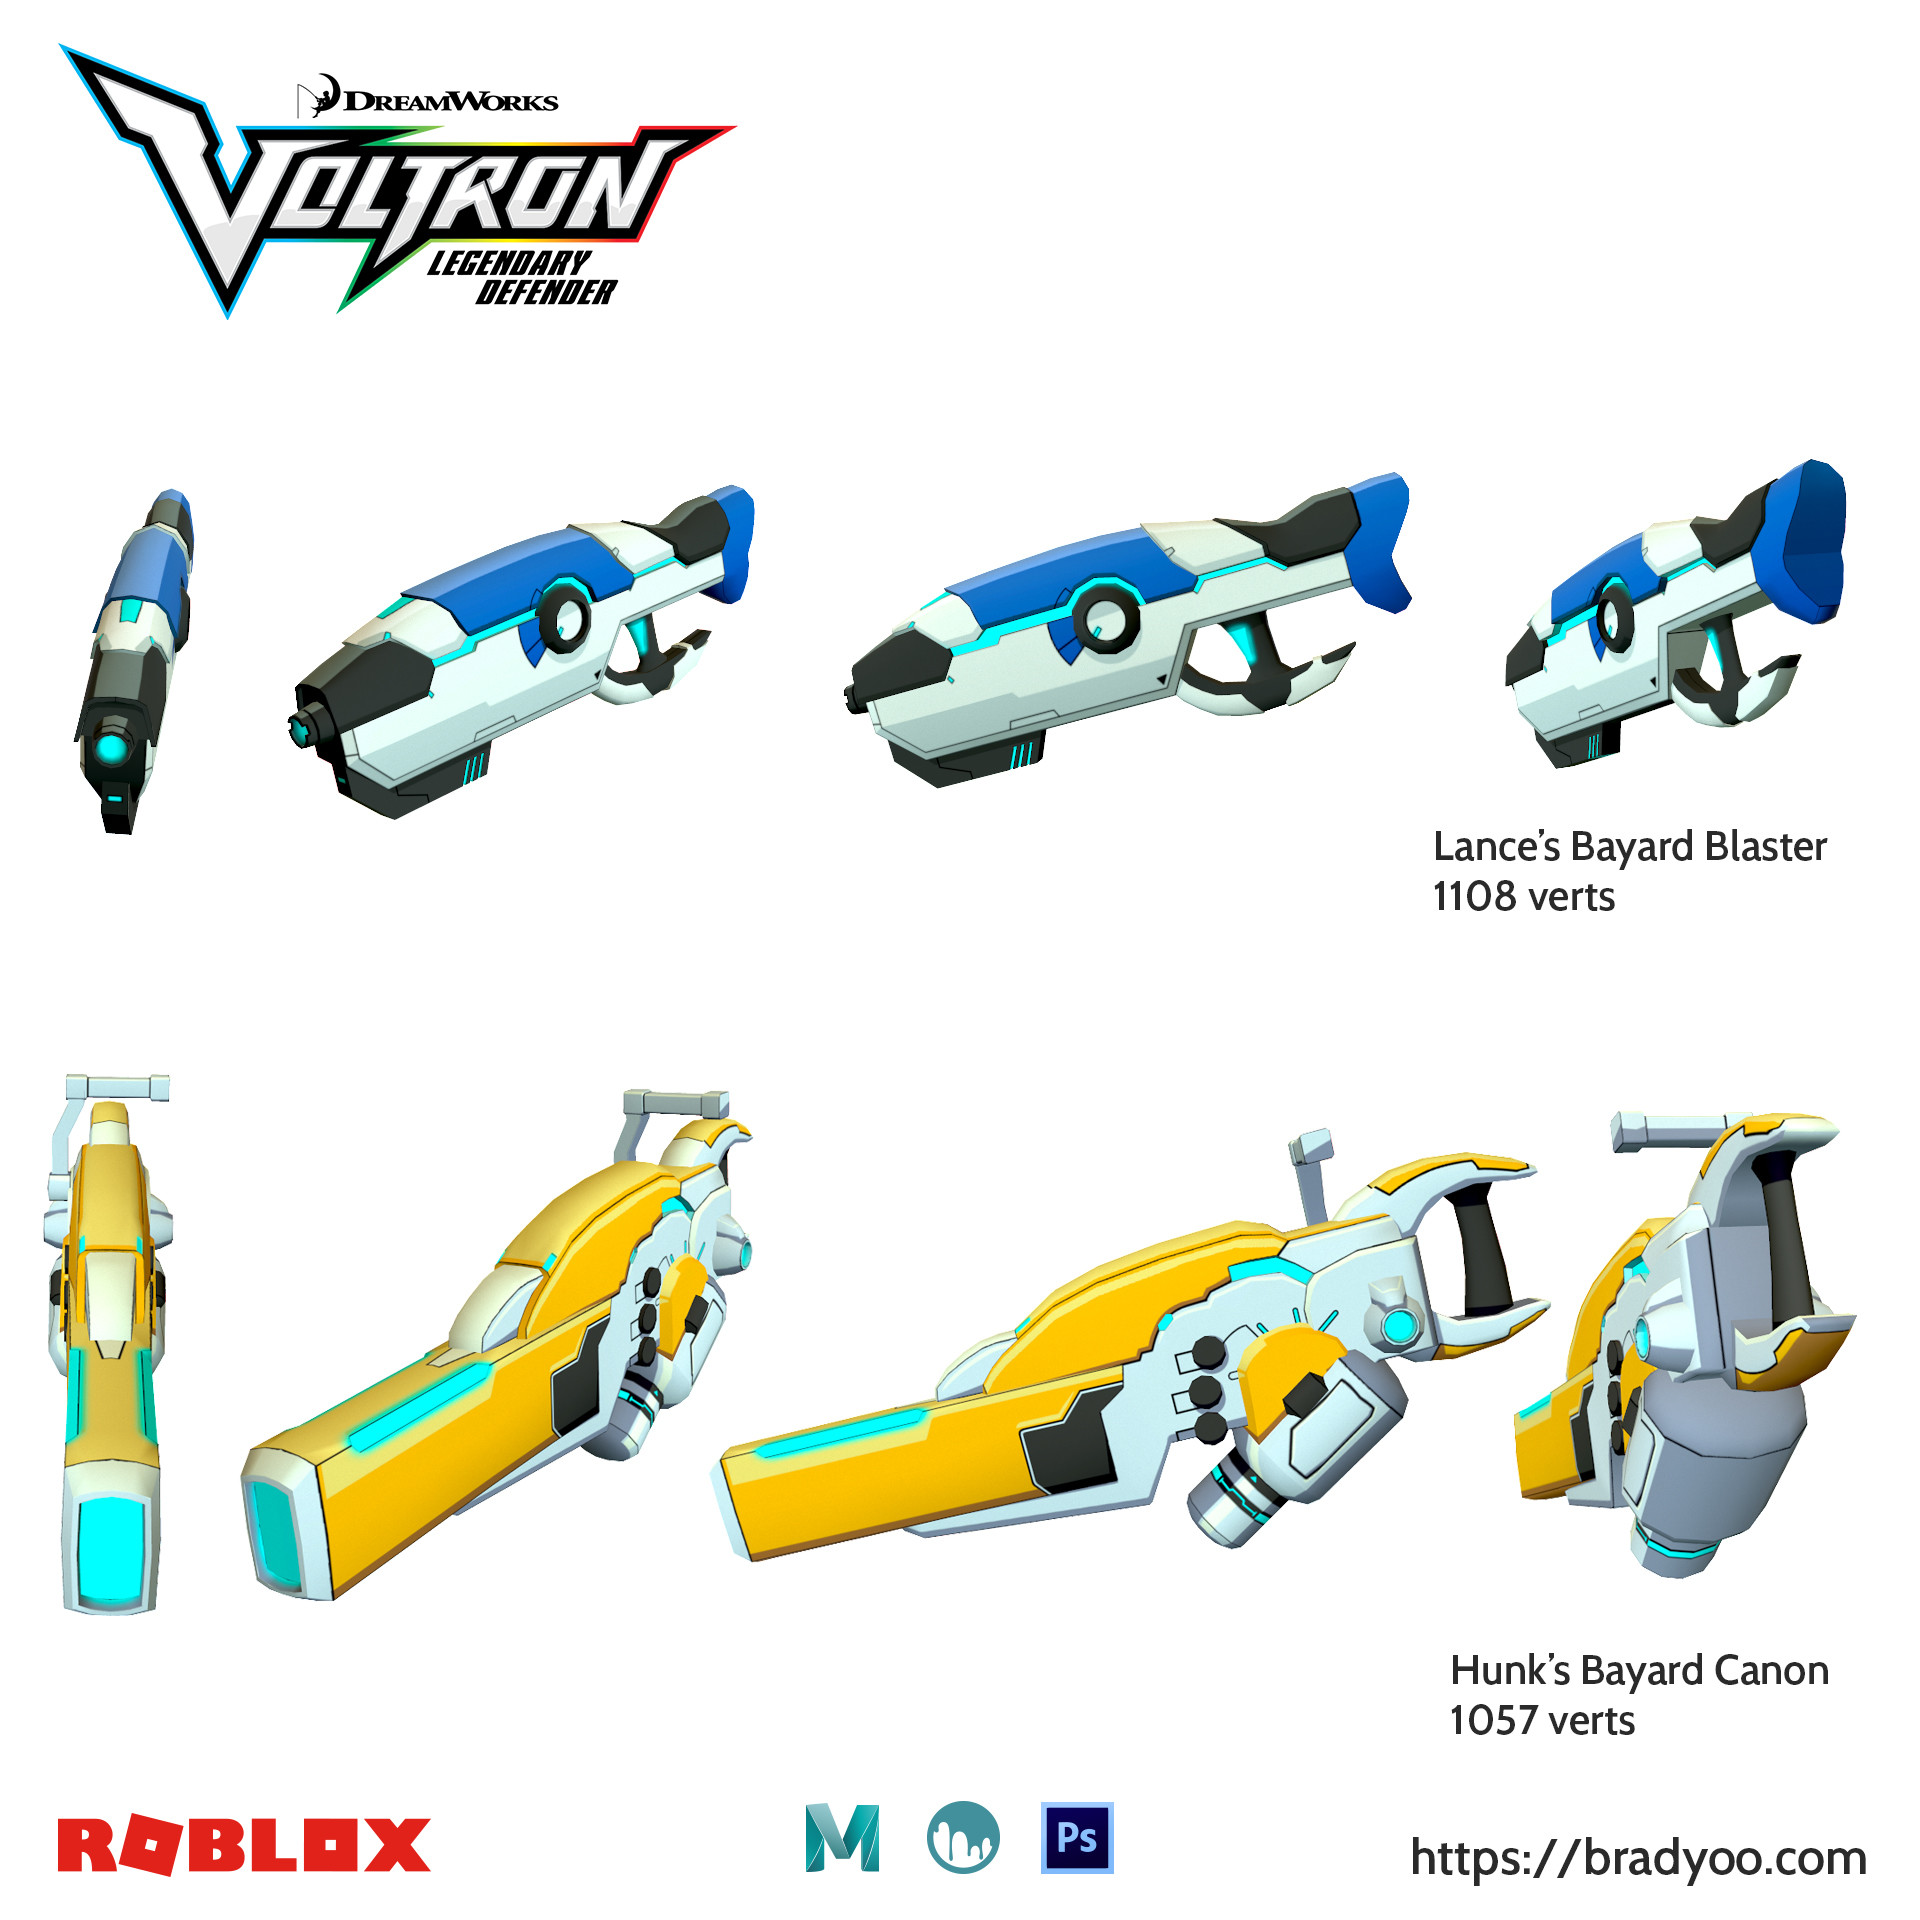 Brx yoo voltron blasters01 roblox 2017